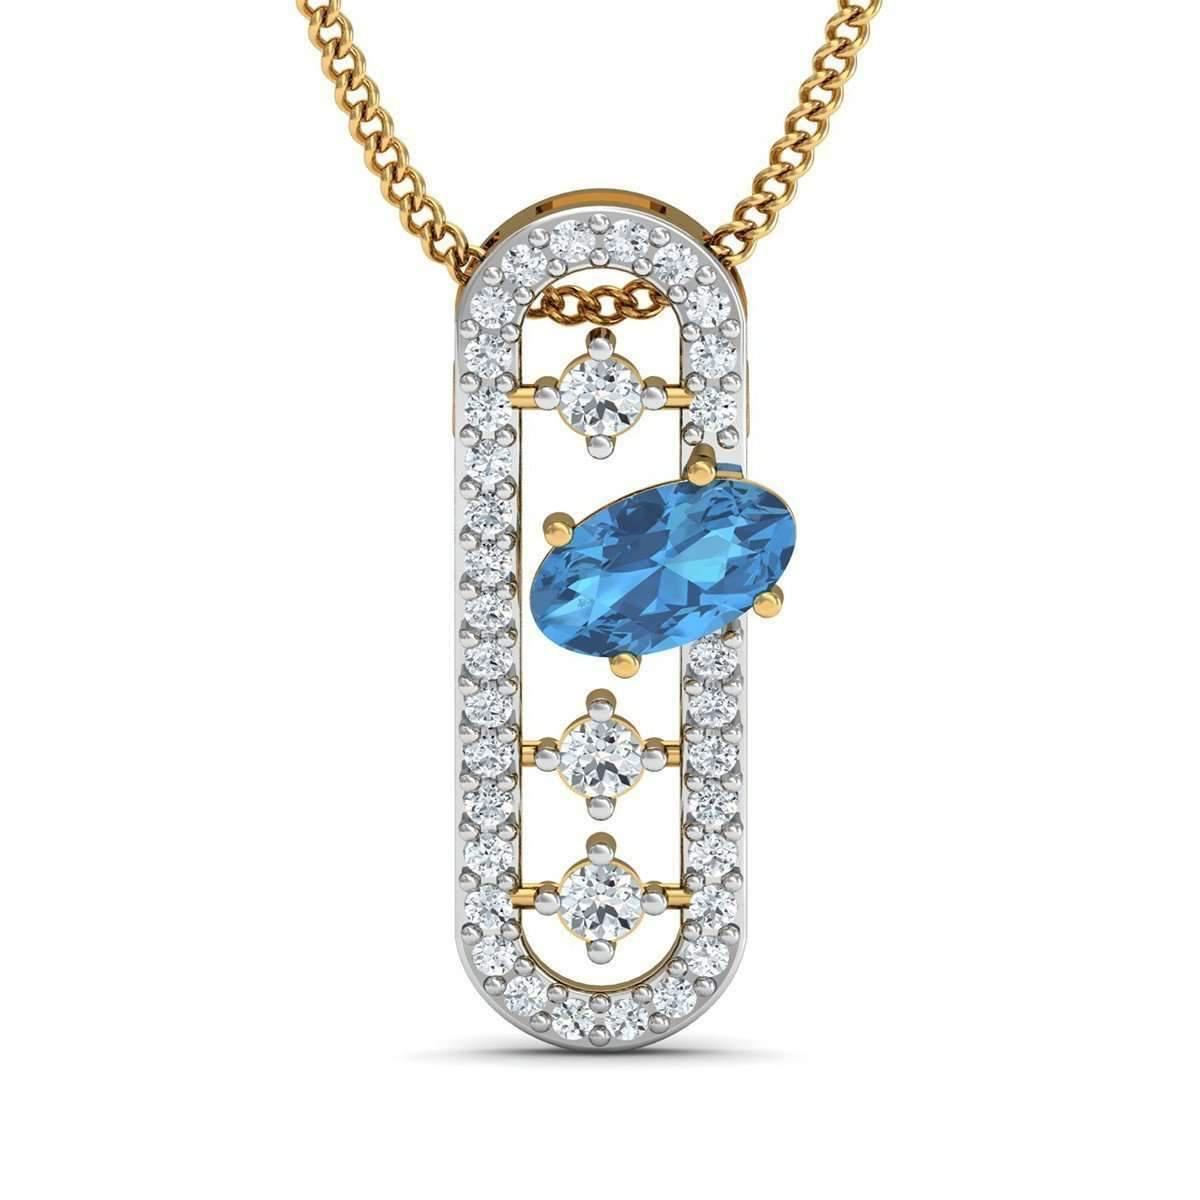 Diamoire Jewels Premium Diamonds and Hand-carved 14kt Yellow Gold Nature Inspired Pendant bTQdmLTV